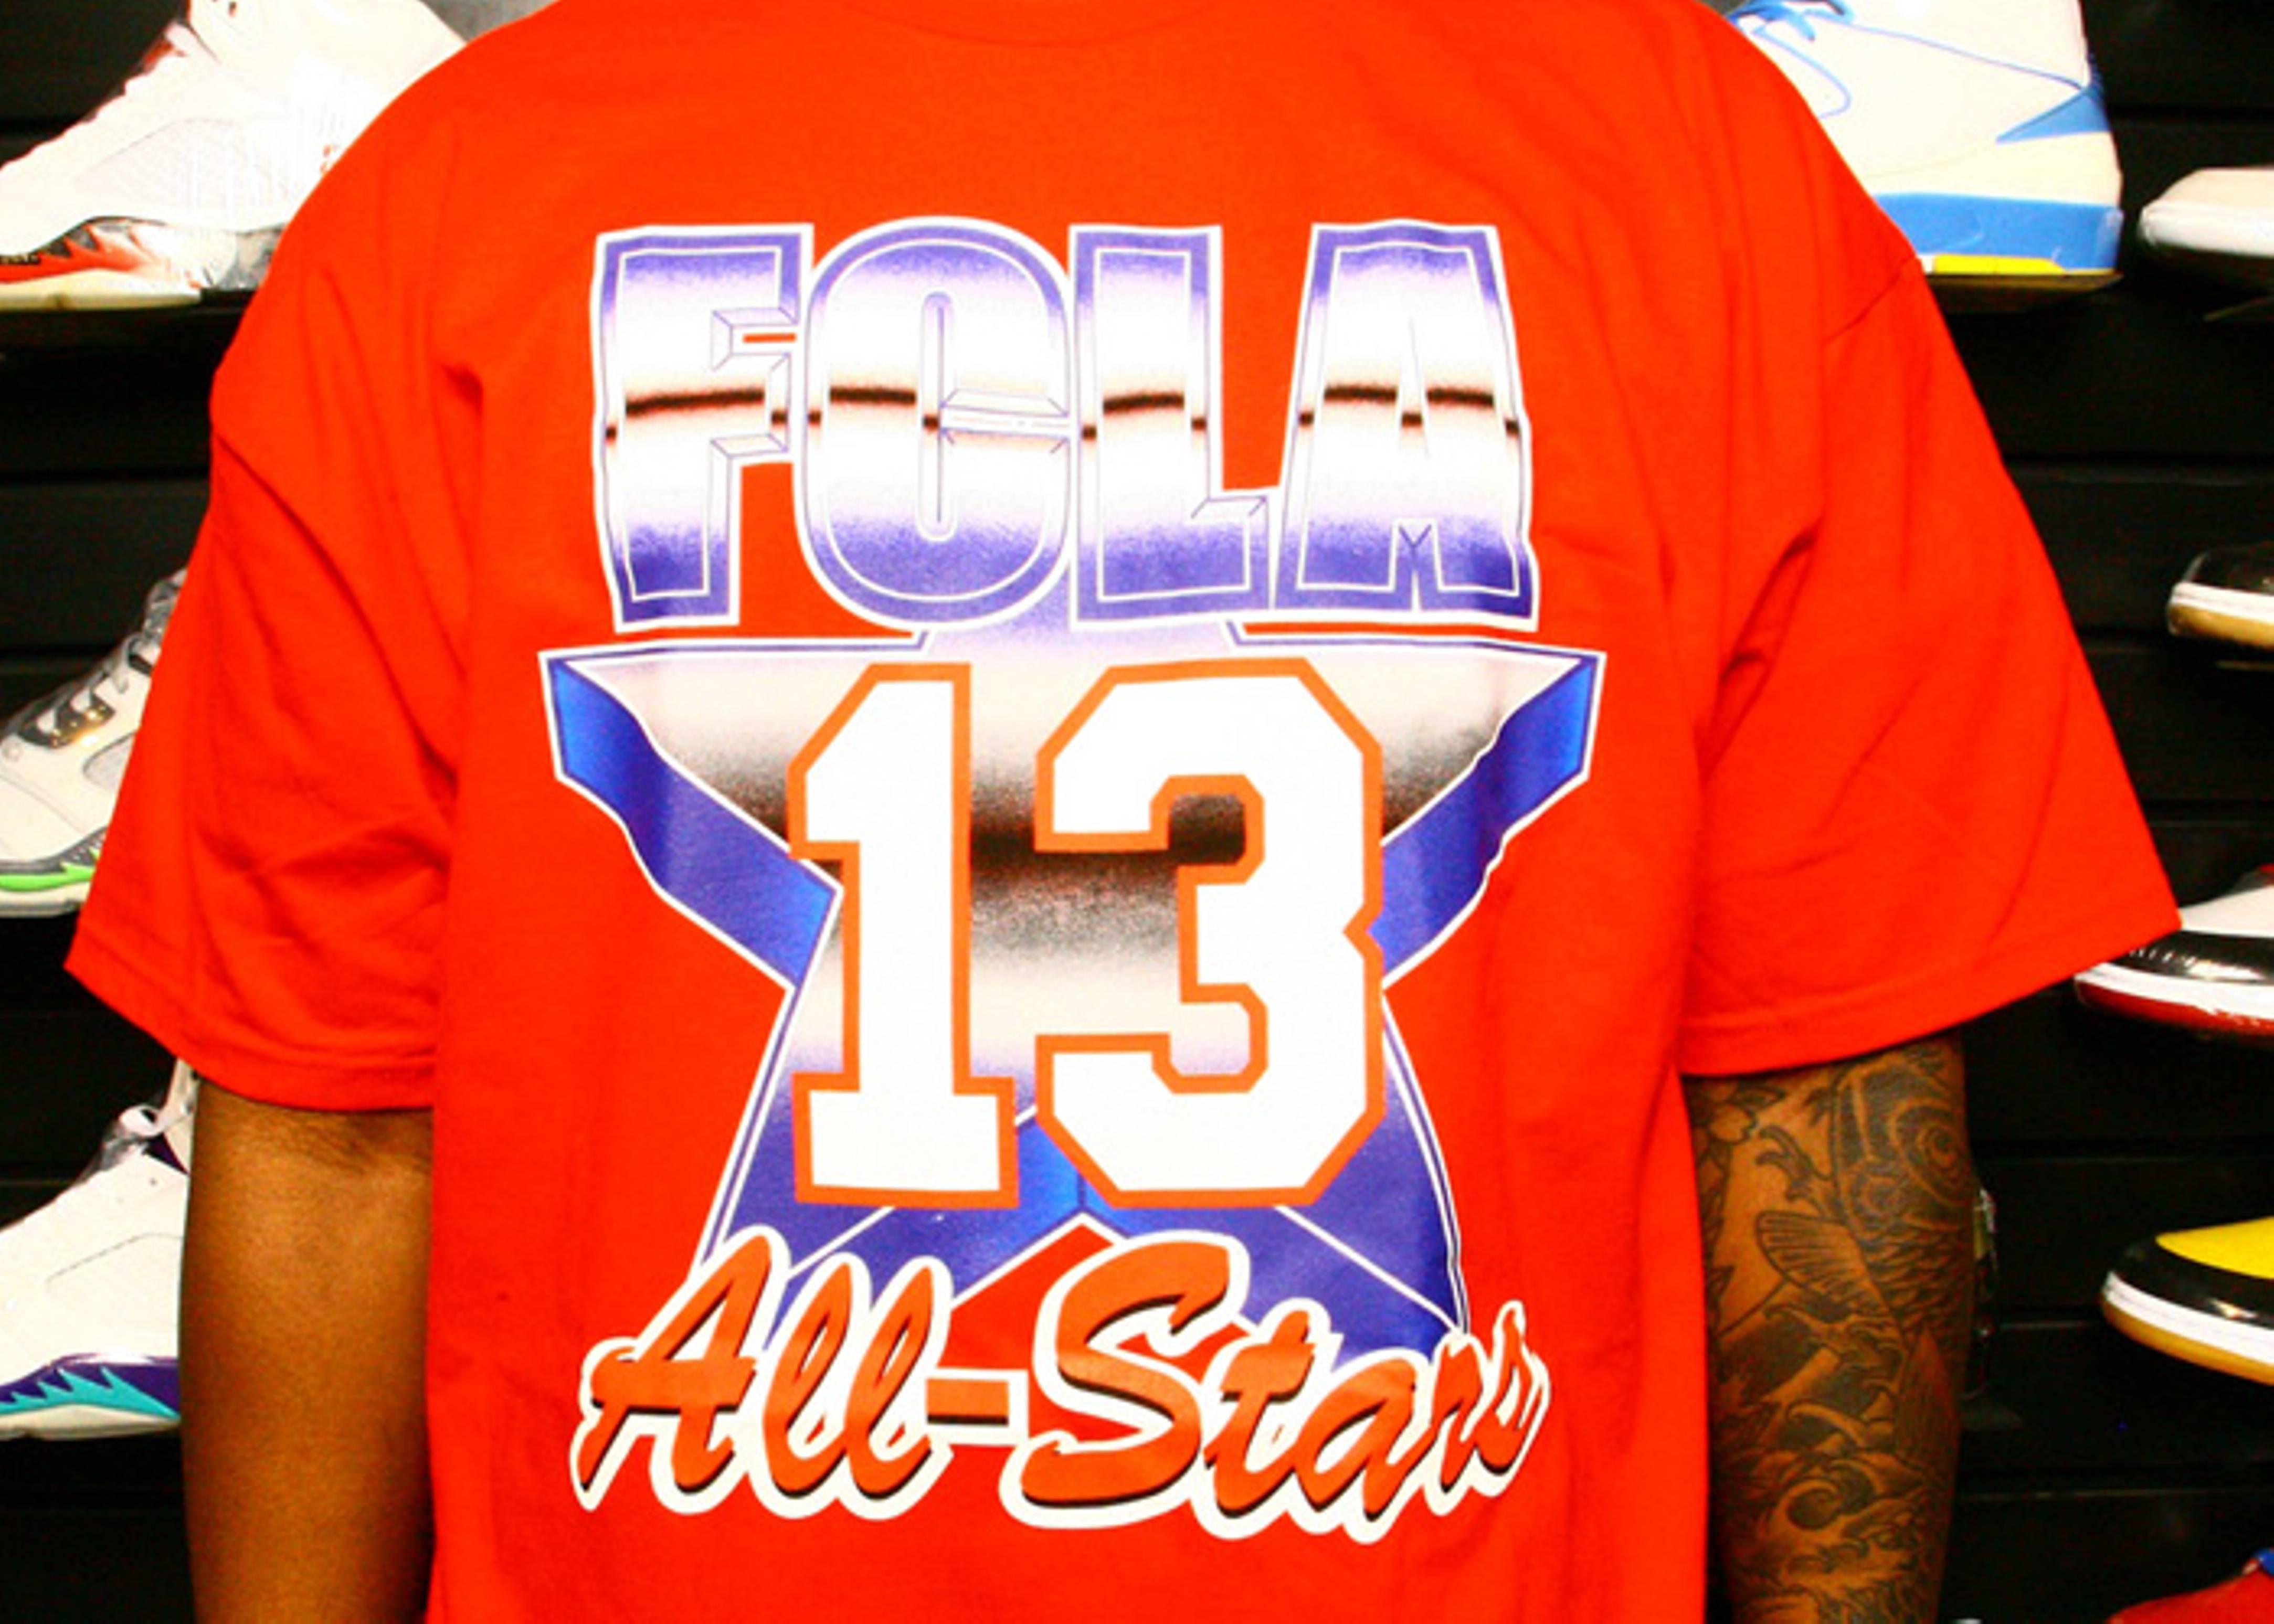 91 all star west t-shirt